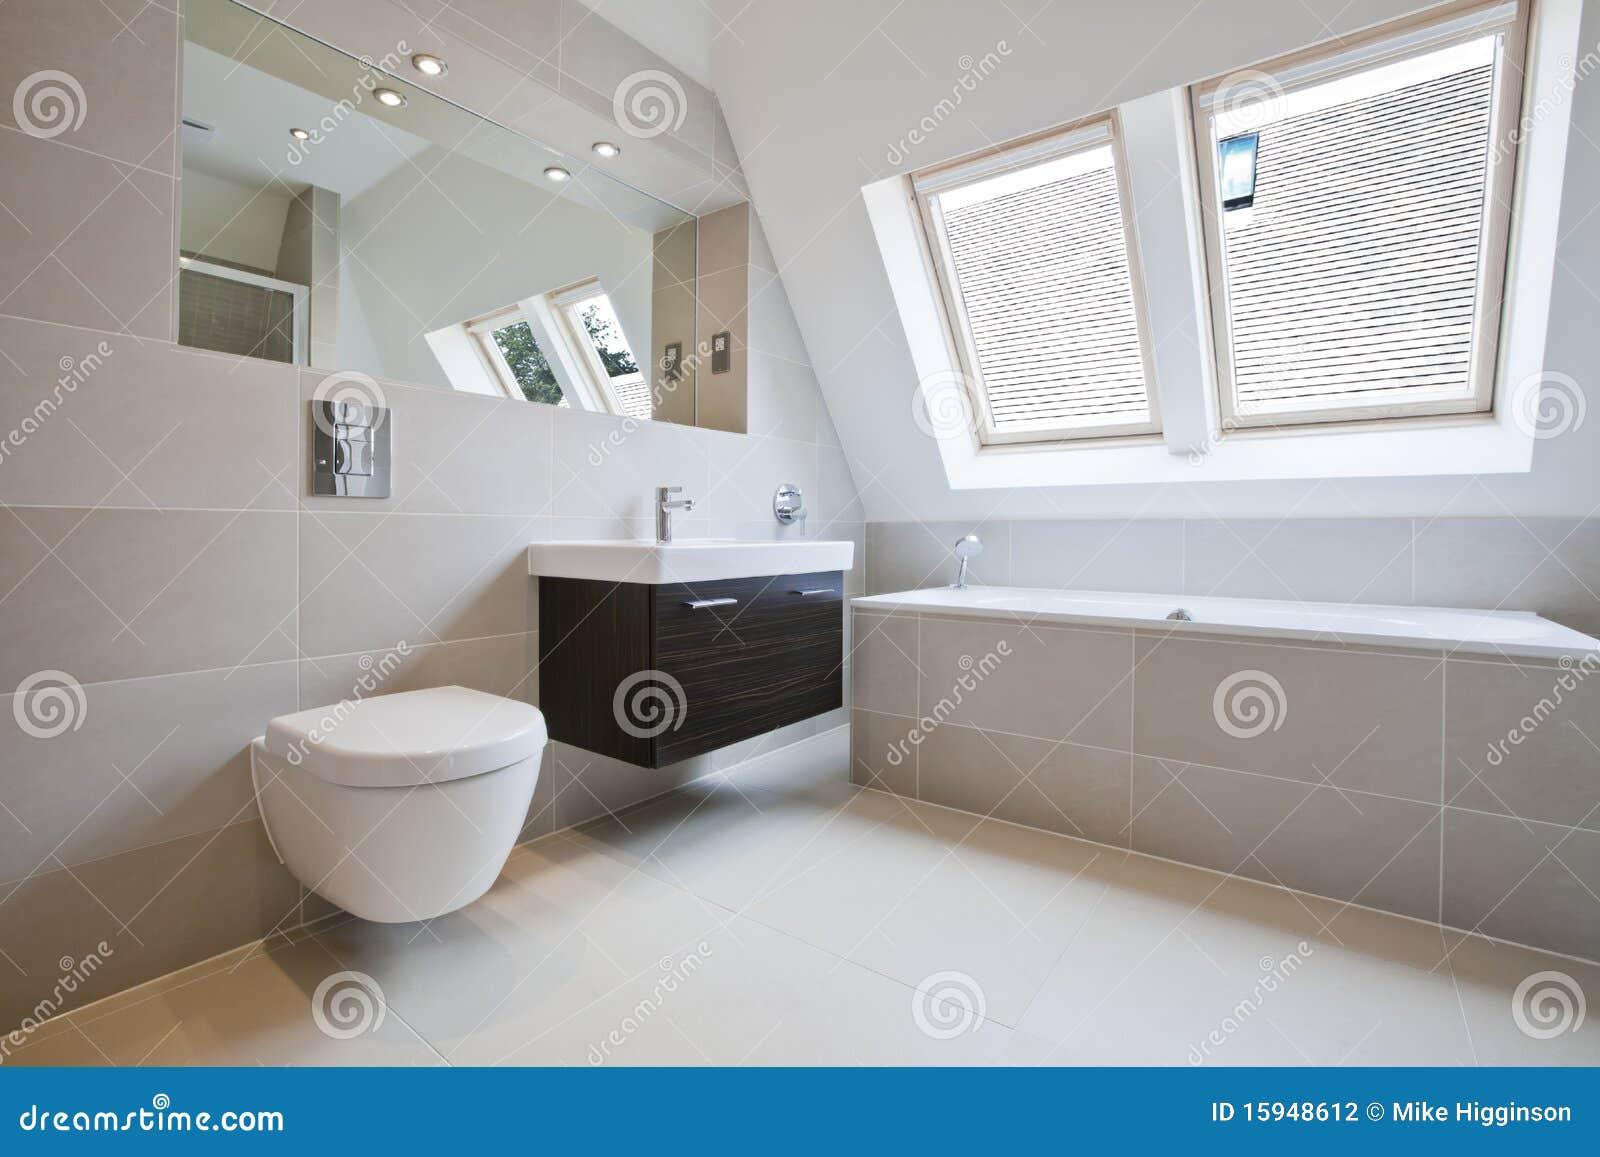 free fabulous cuarto de bao de lujo moderno with cuartos bao modernos with cuartos bao modernos - Cuartos De Bao Modernos